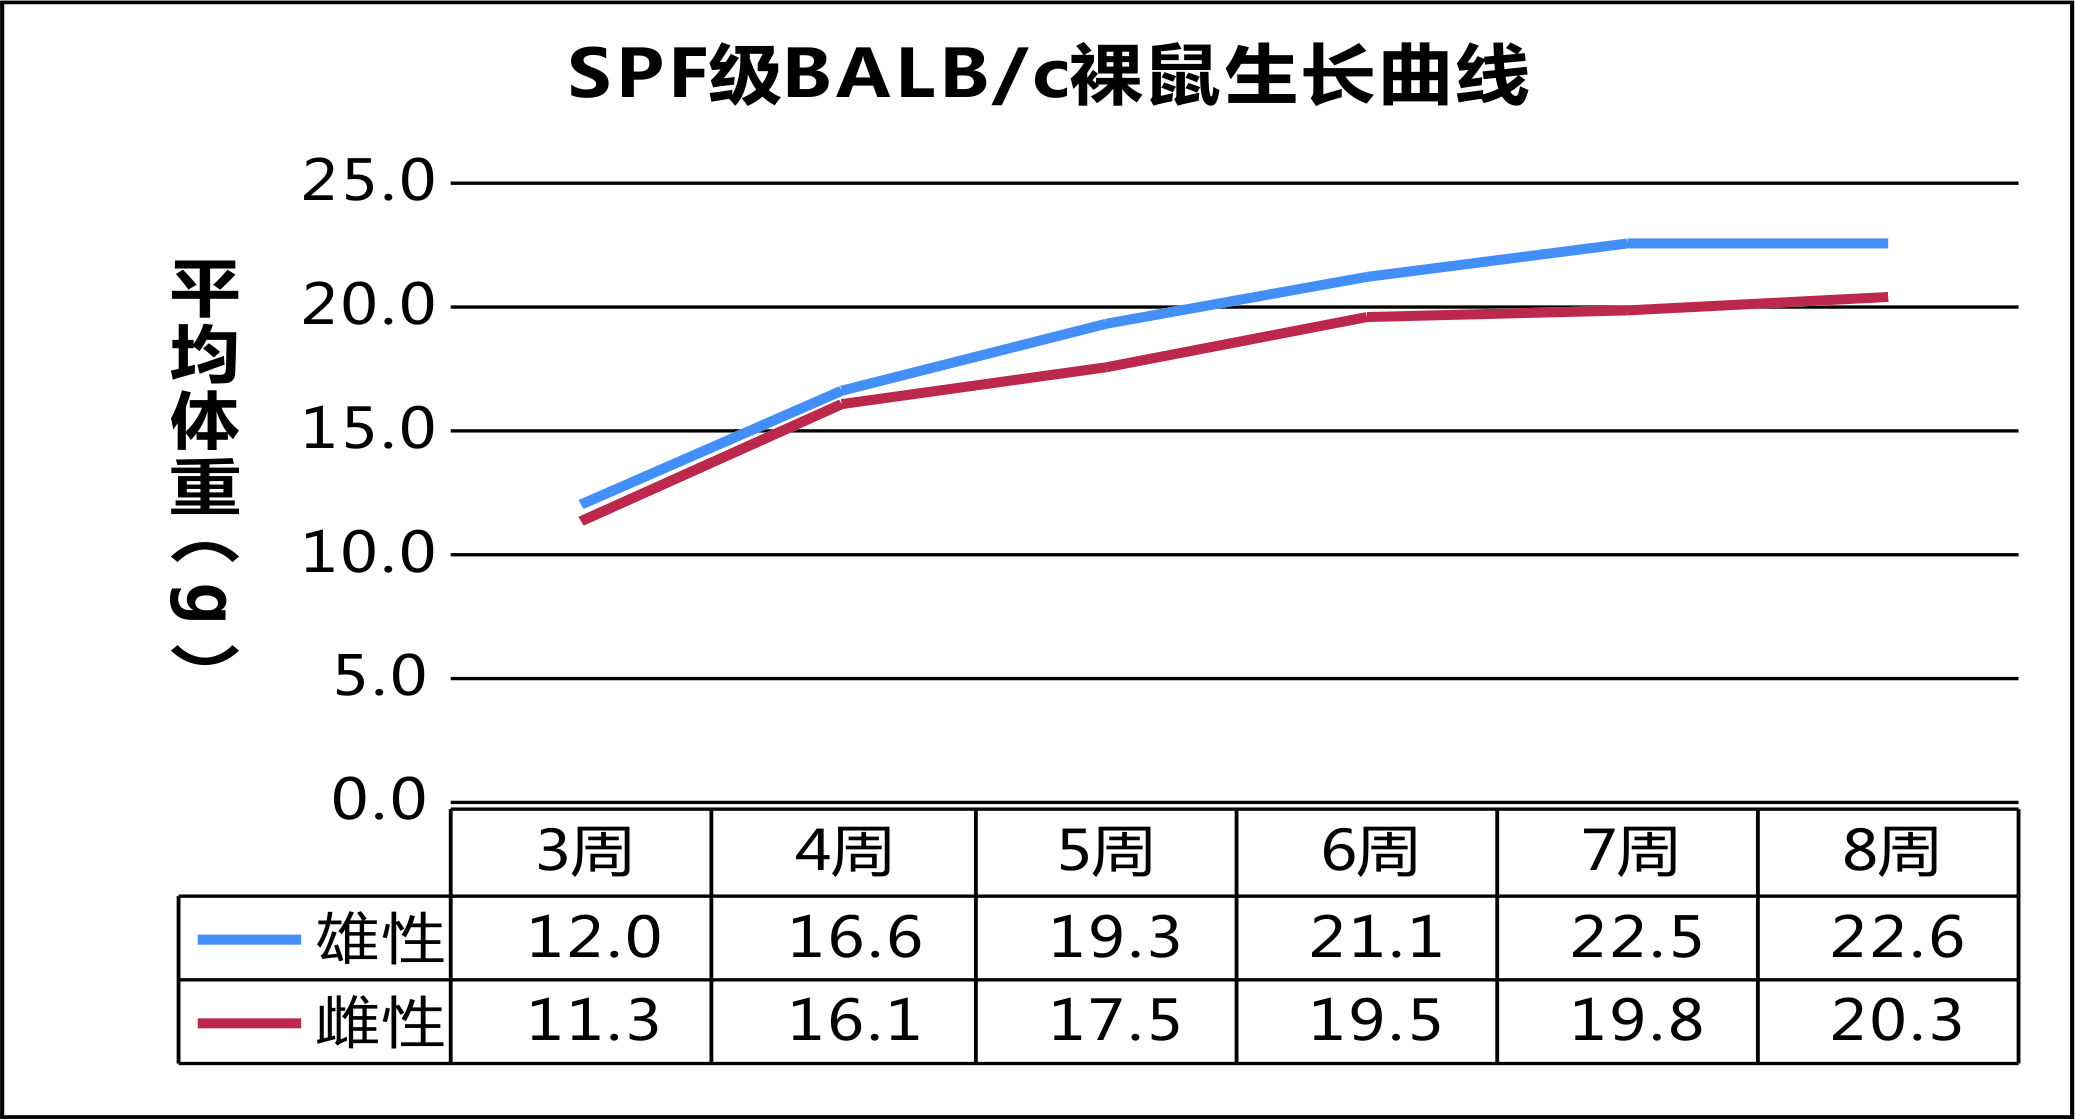 SPF级BALBc裸鼠生长曲线.jpg